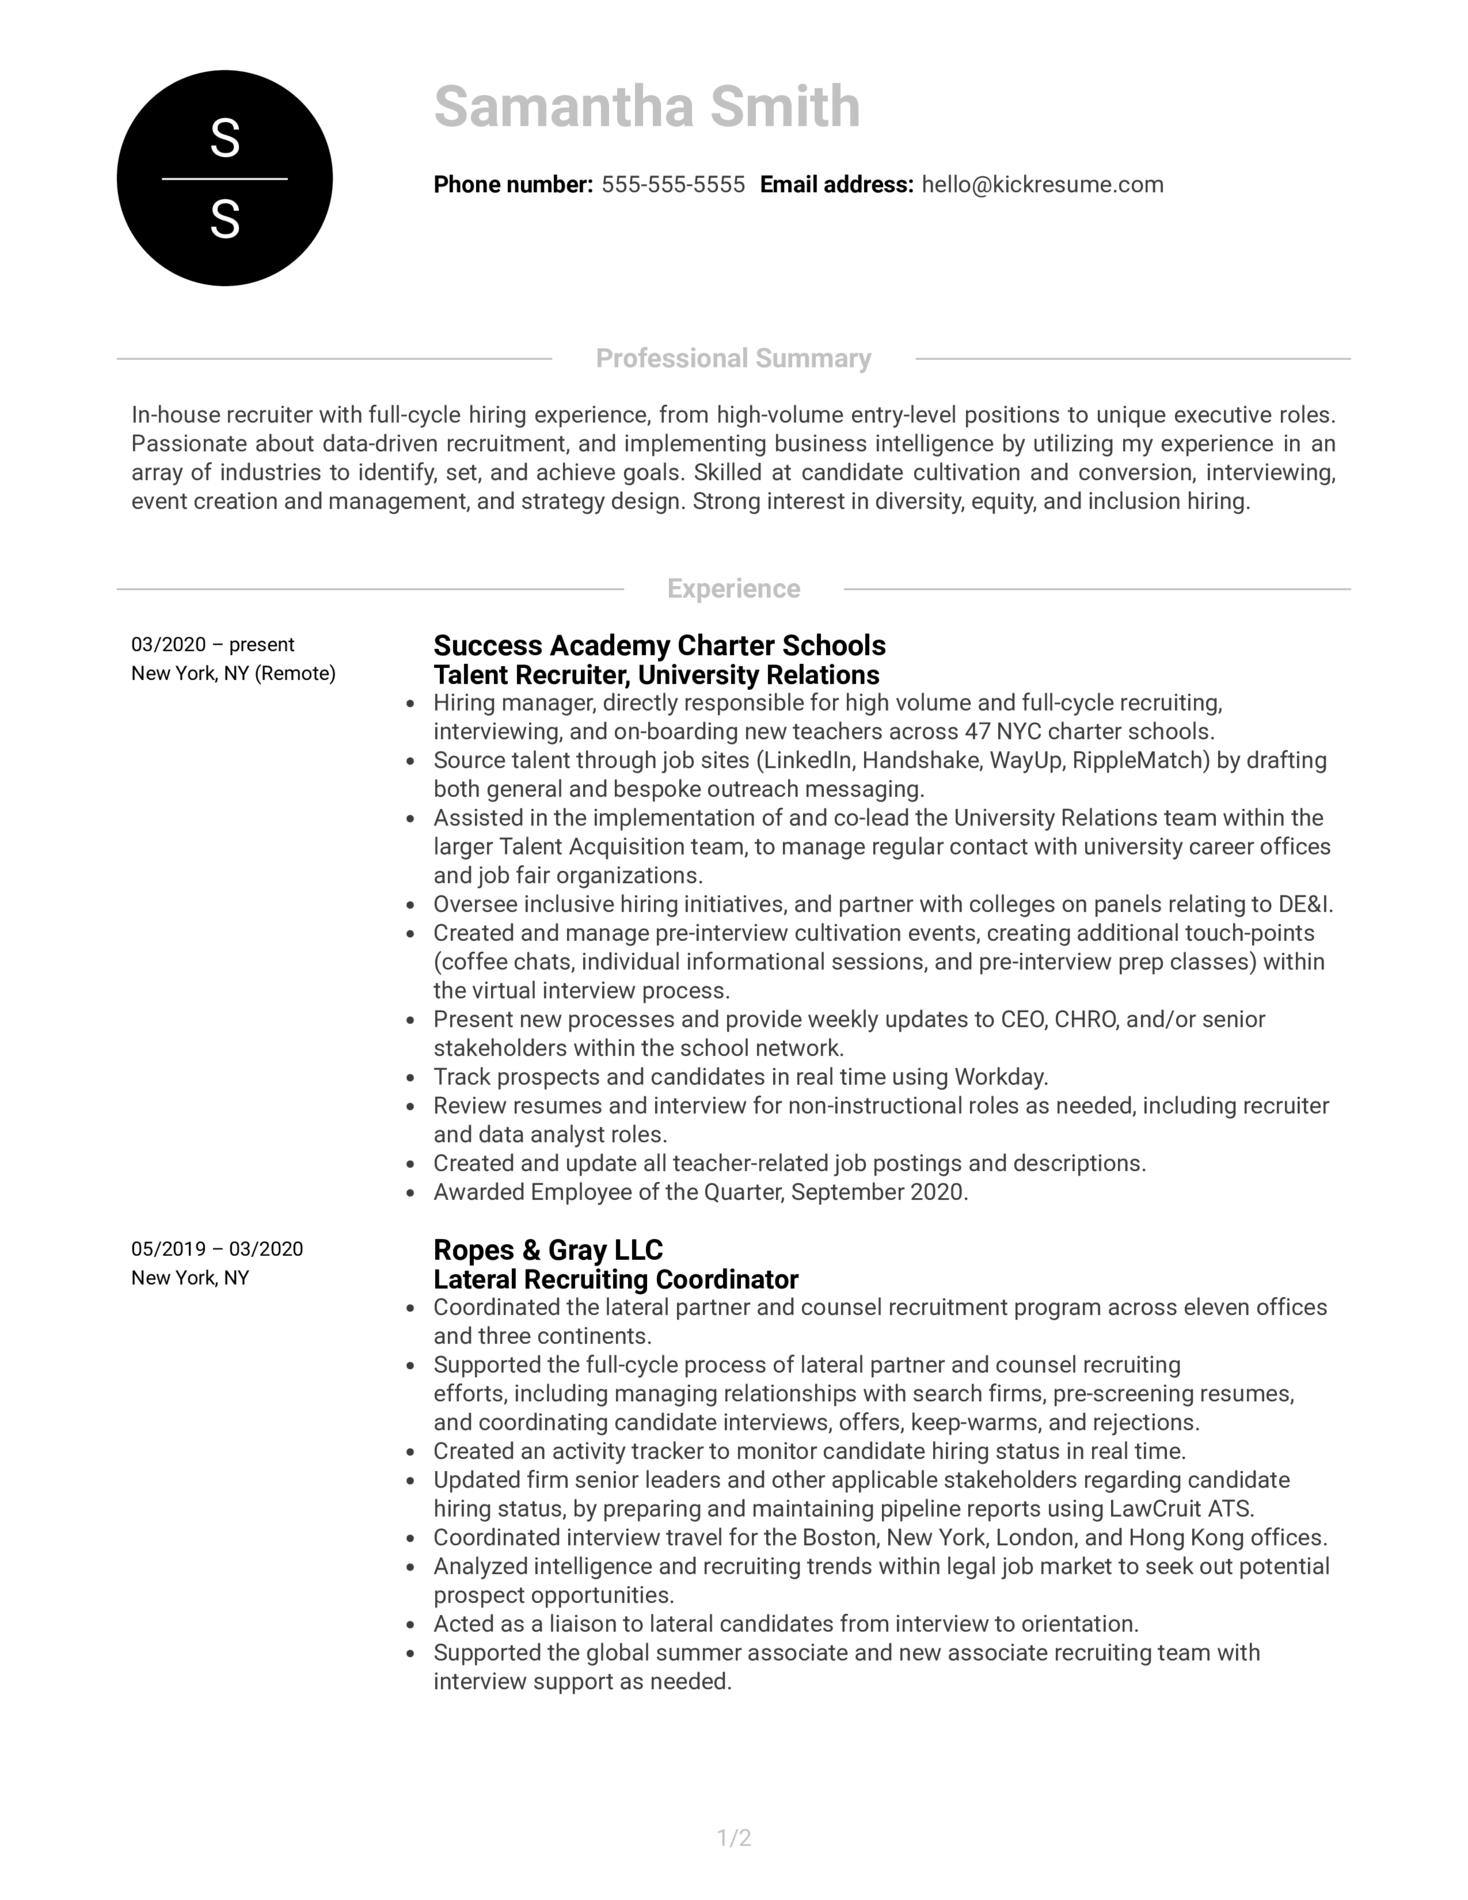 Recruiter at RapidSOS Resume Sample (Part 1)